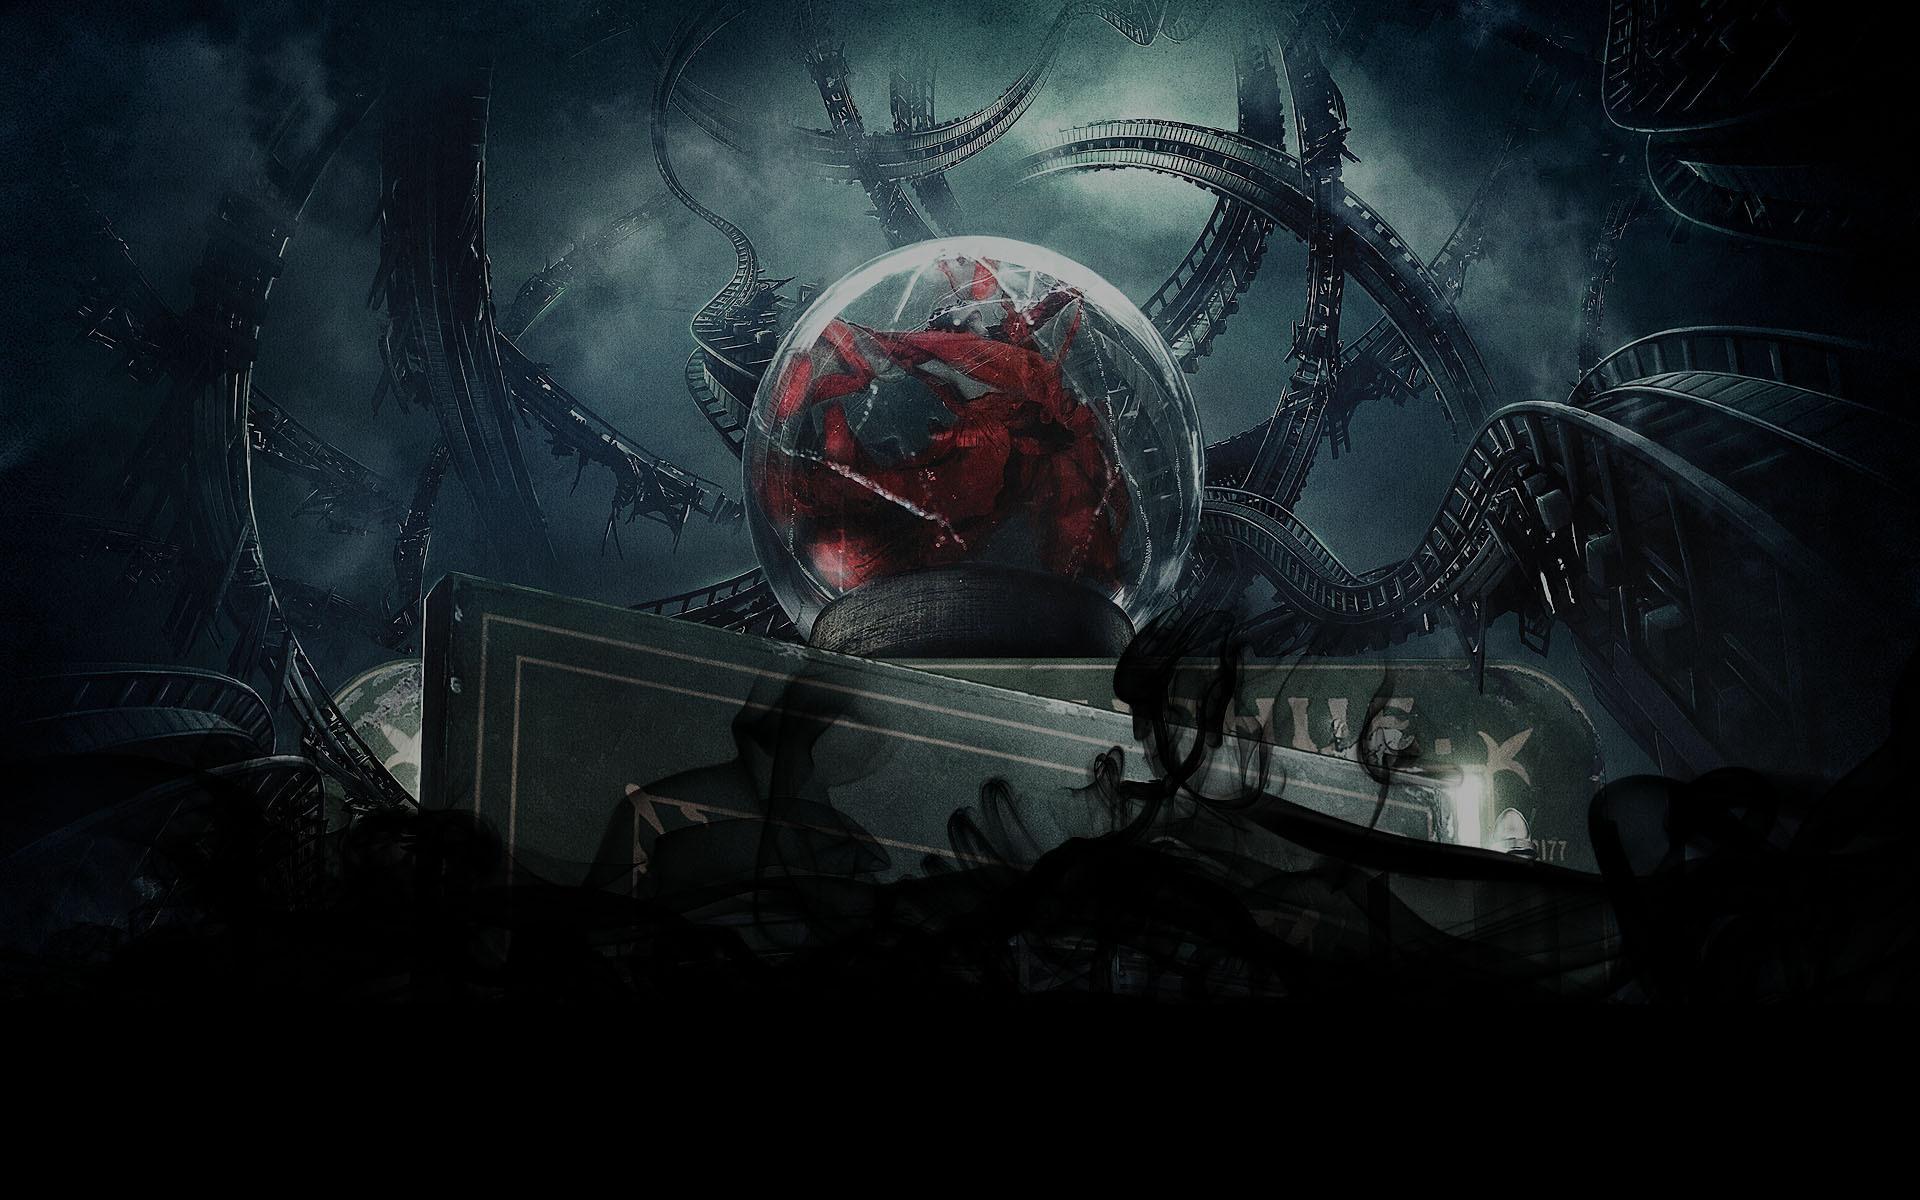 Dark gothic art horror sci fi wallpaper 1920x1200 28815 1920x1200